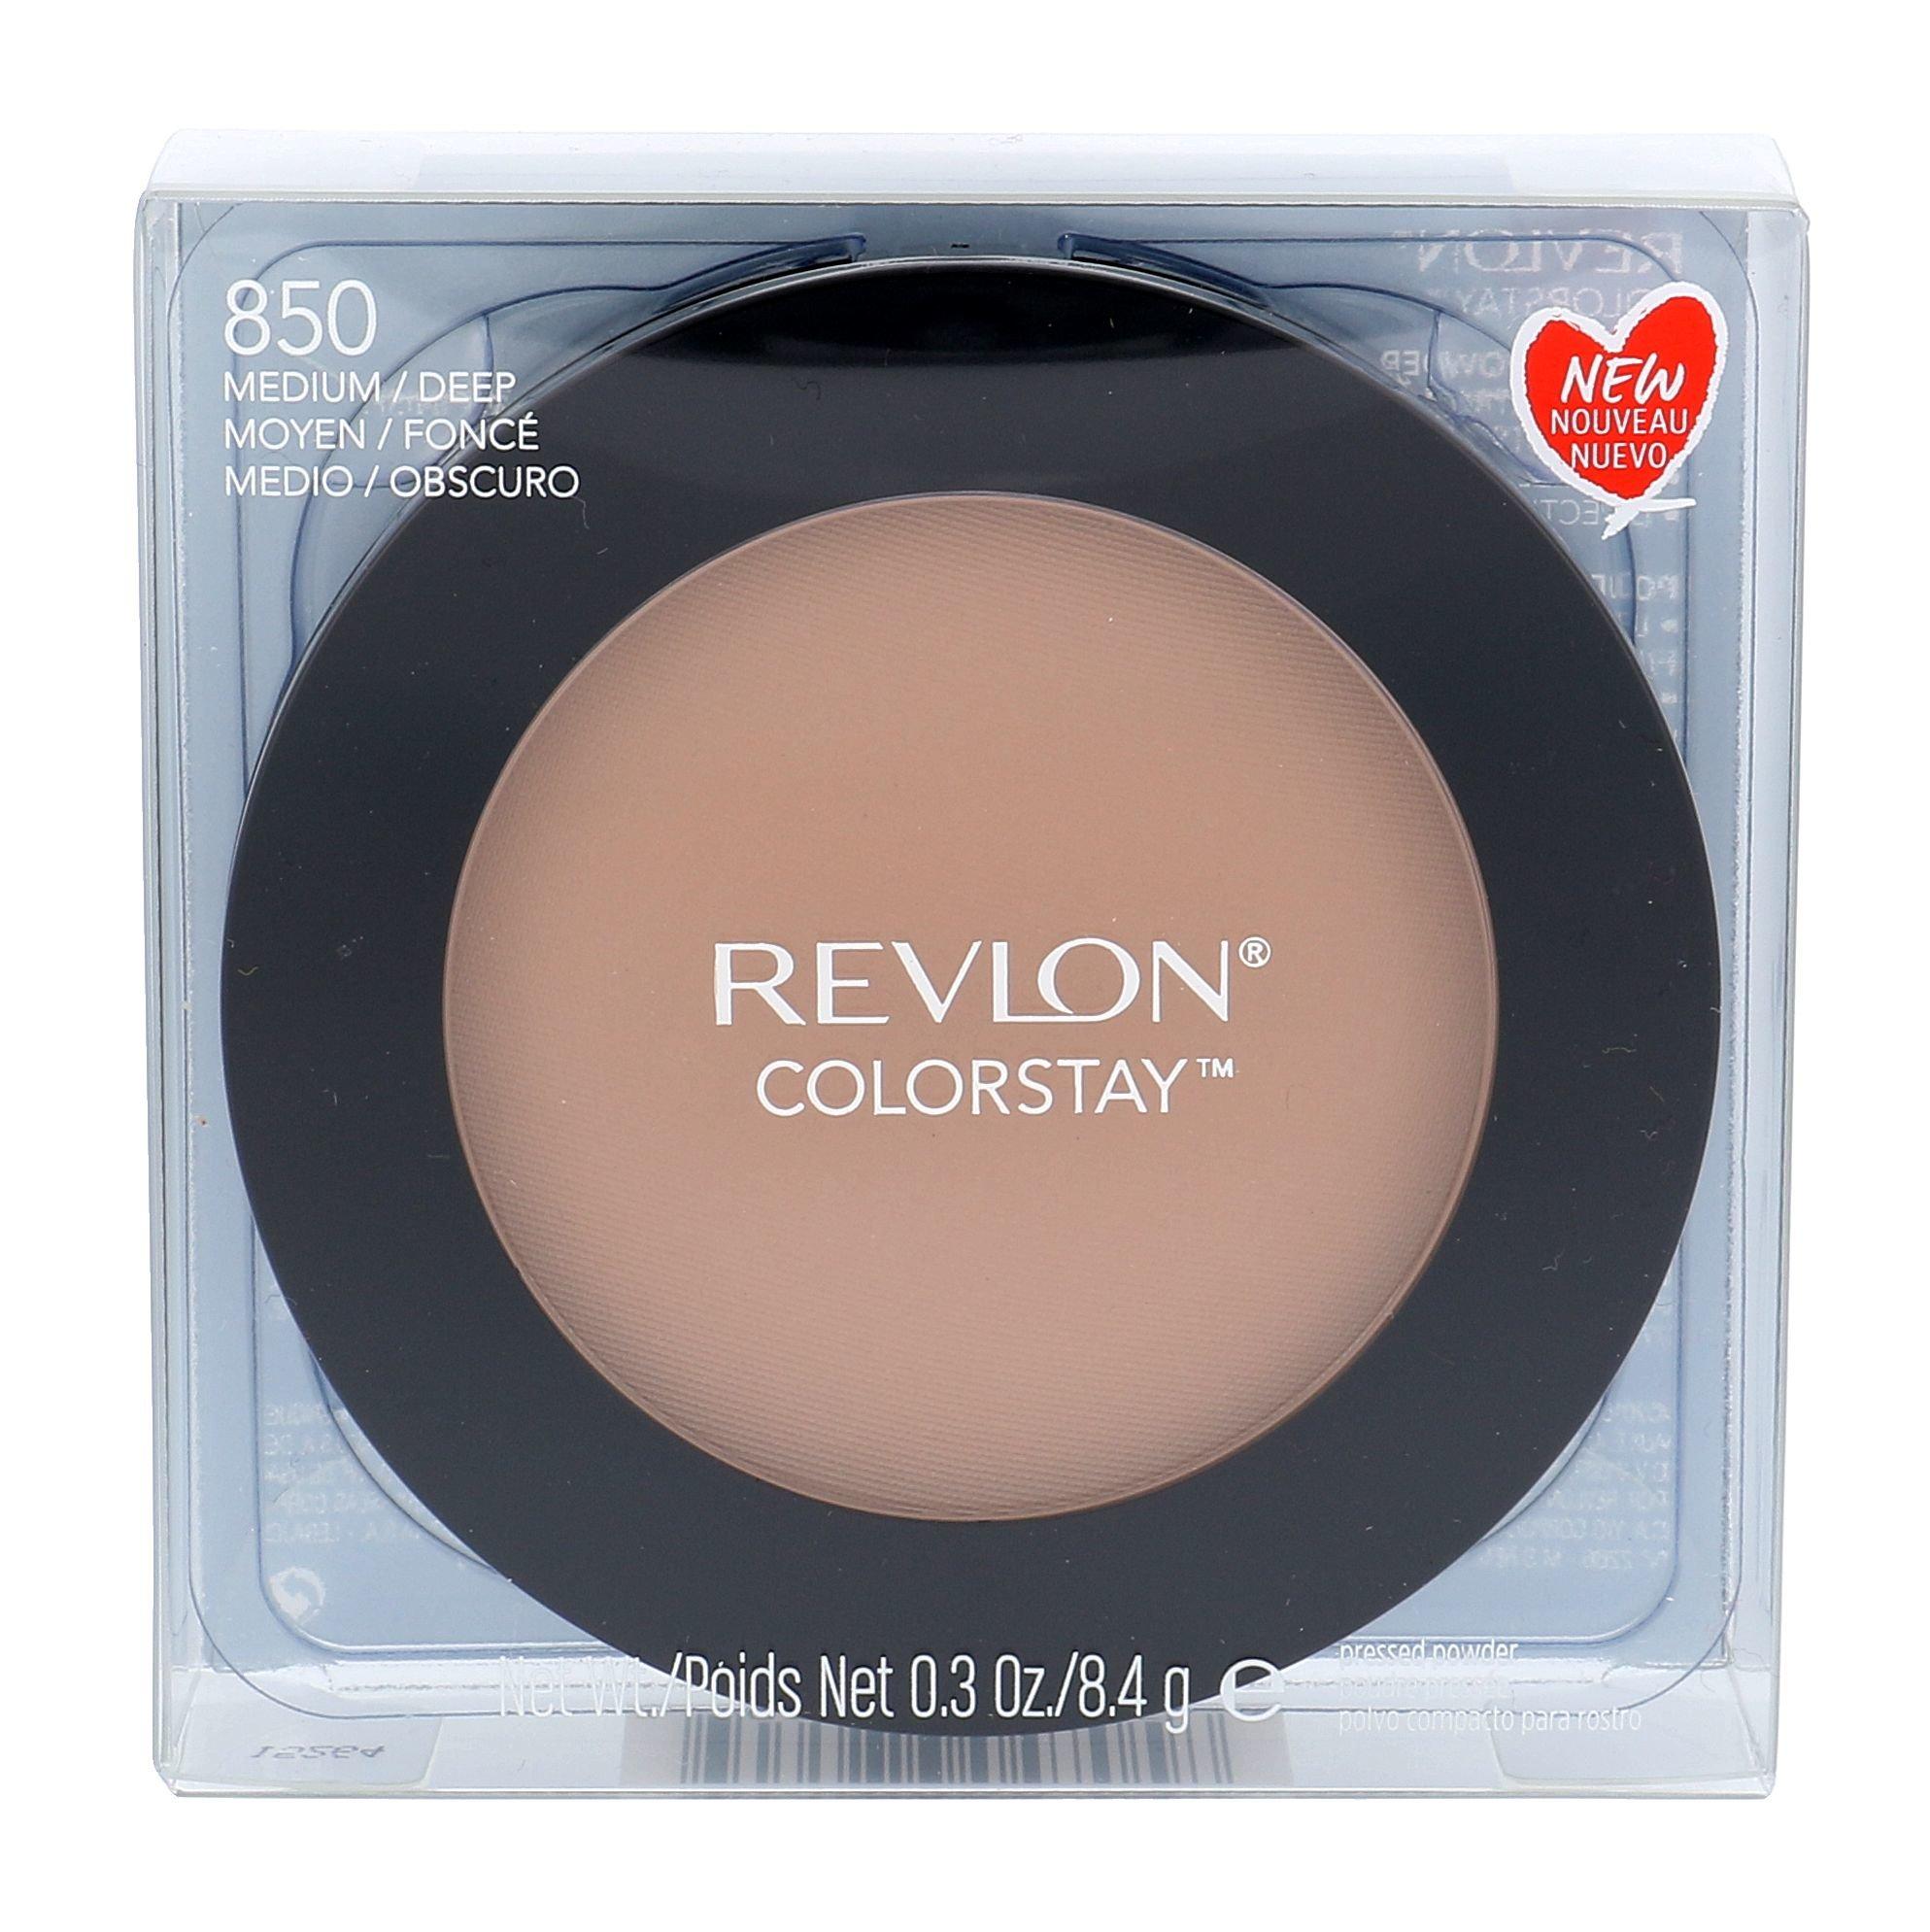 Revlon Colorstay Cosmetic 8,4ml 850 Medium/Deep